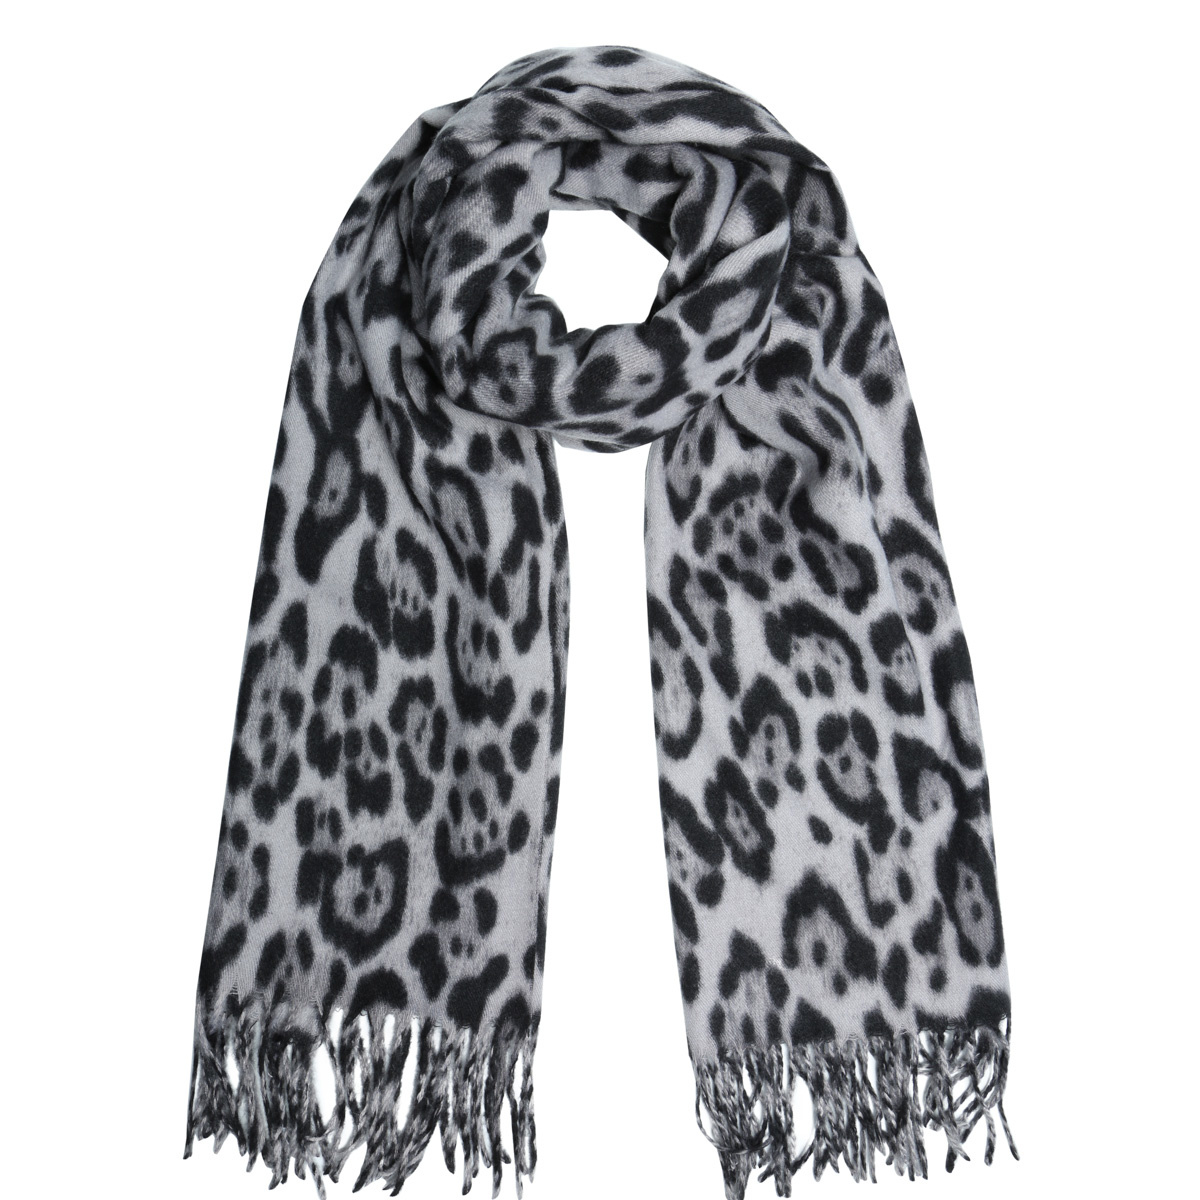 Joboly Scarf leopard print